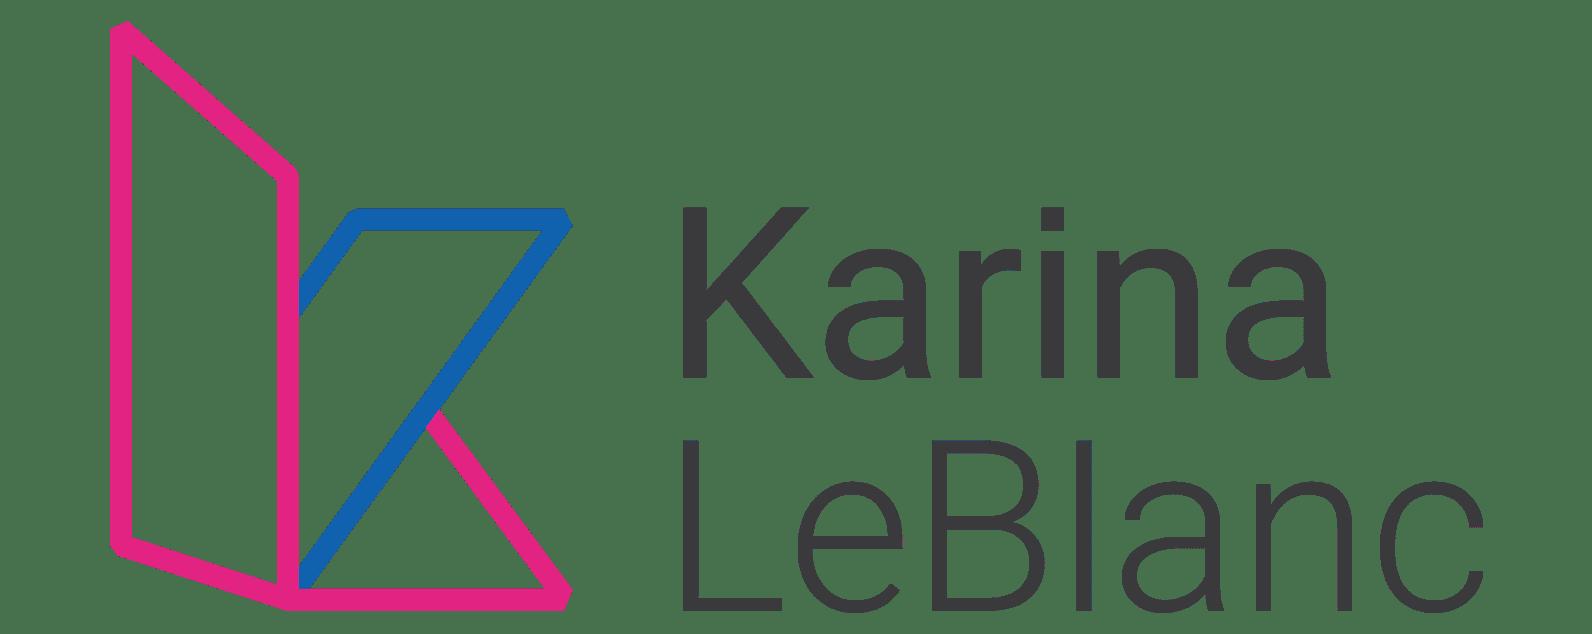 Y5 Creative Case Studies Logo Karina Leblanc